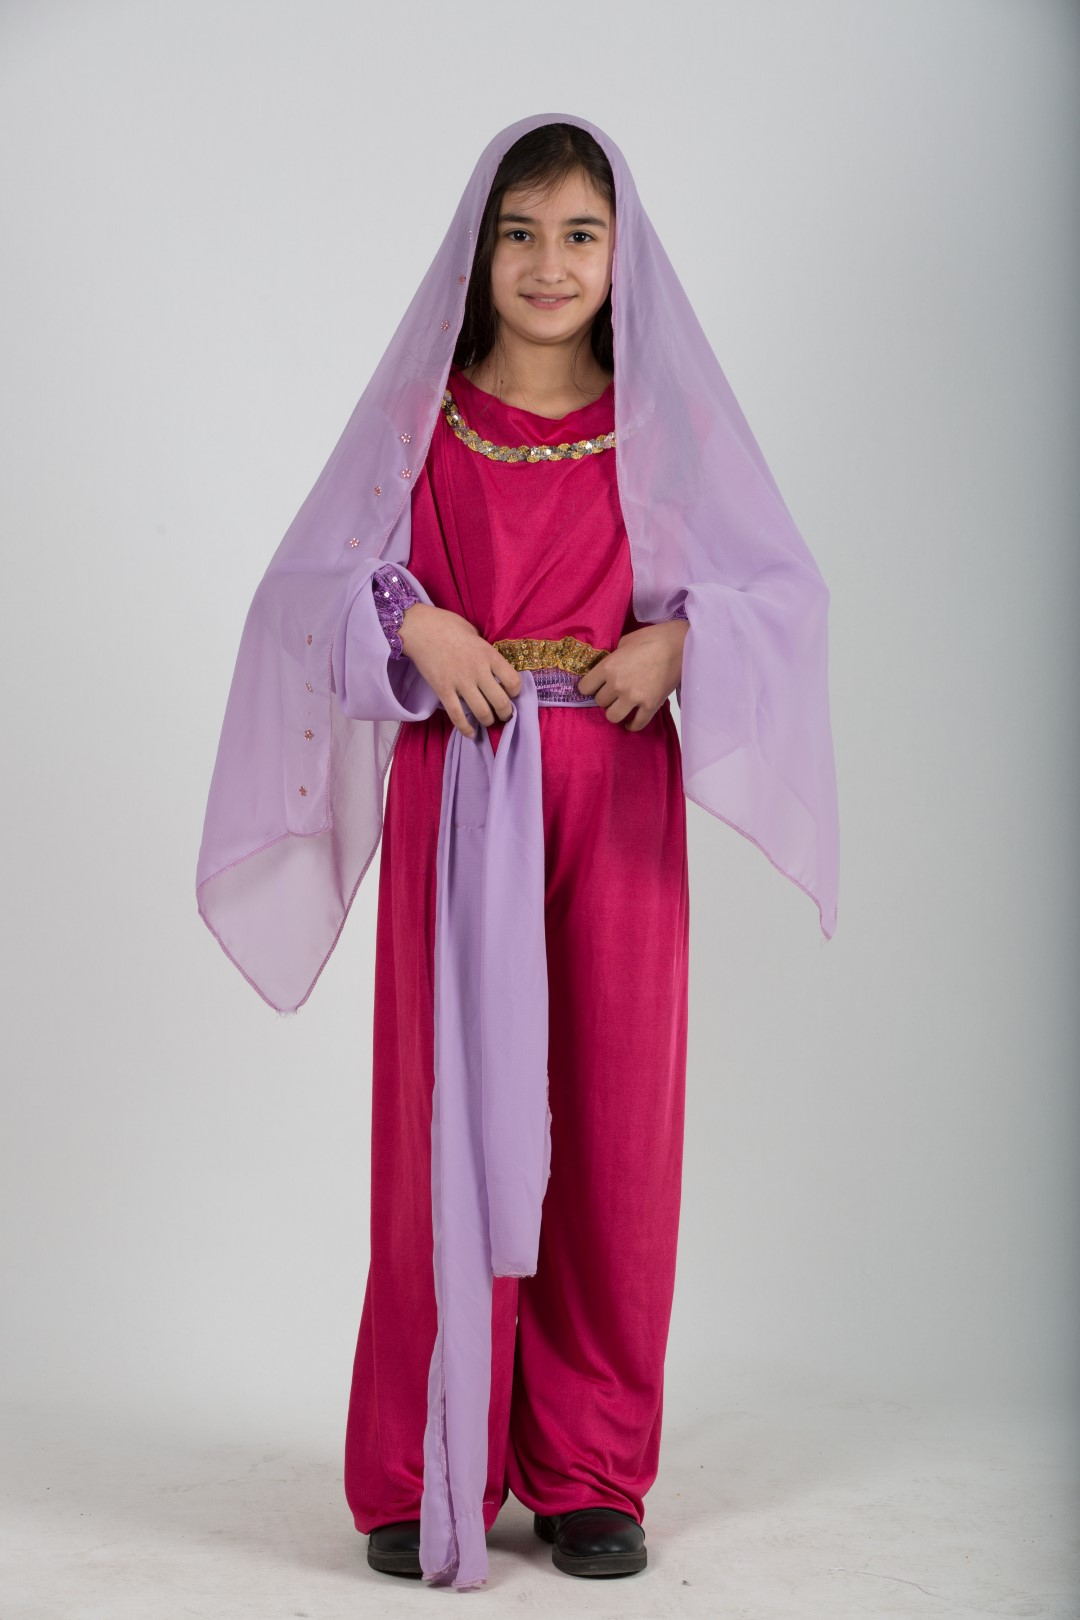 Arap-kız-kostum-fusya-lila